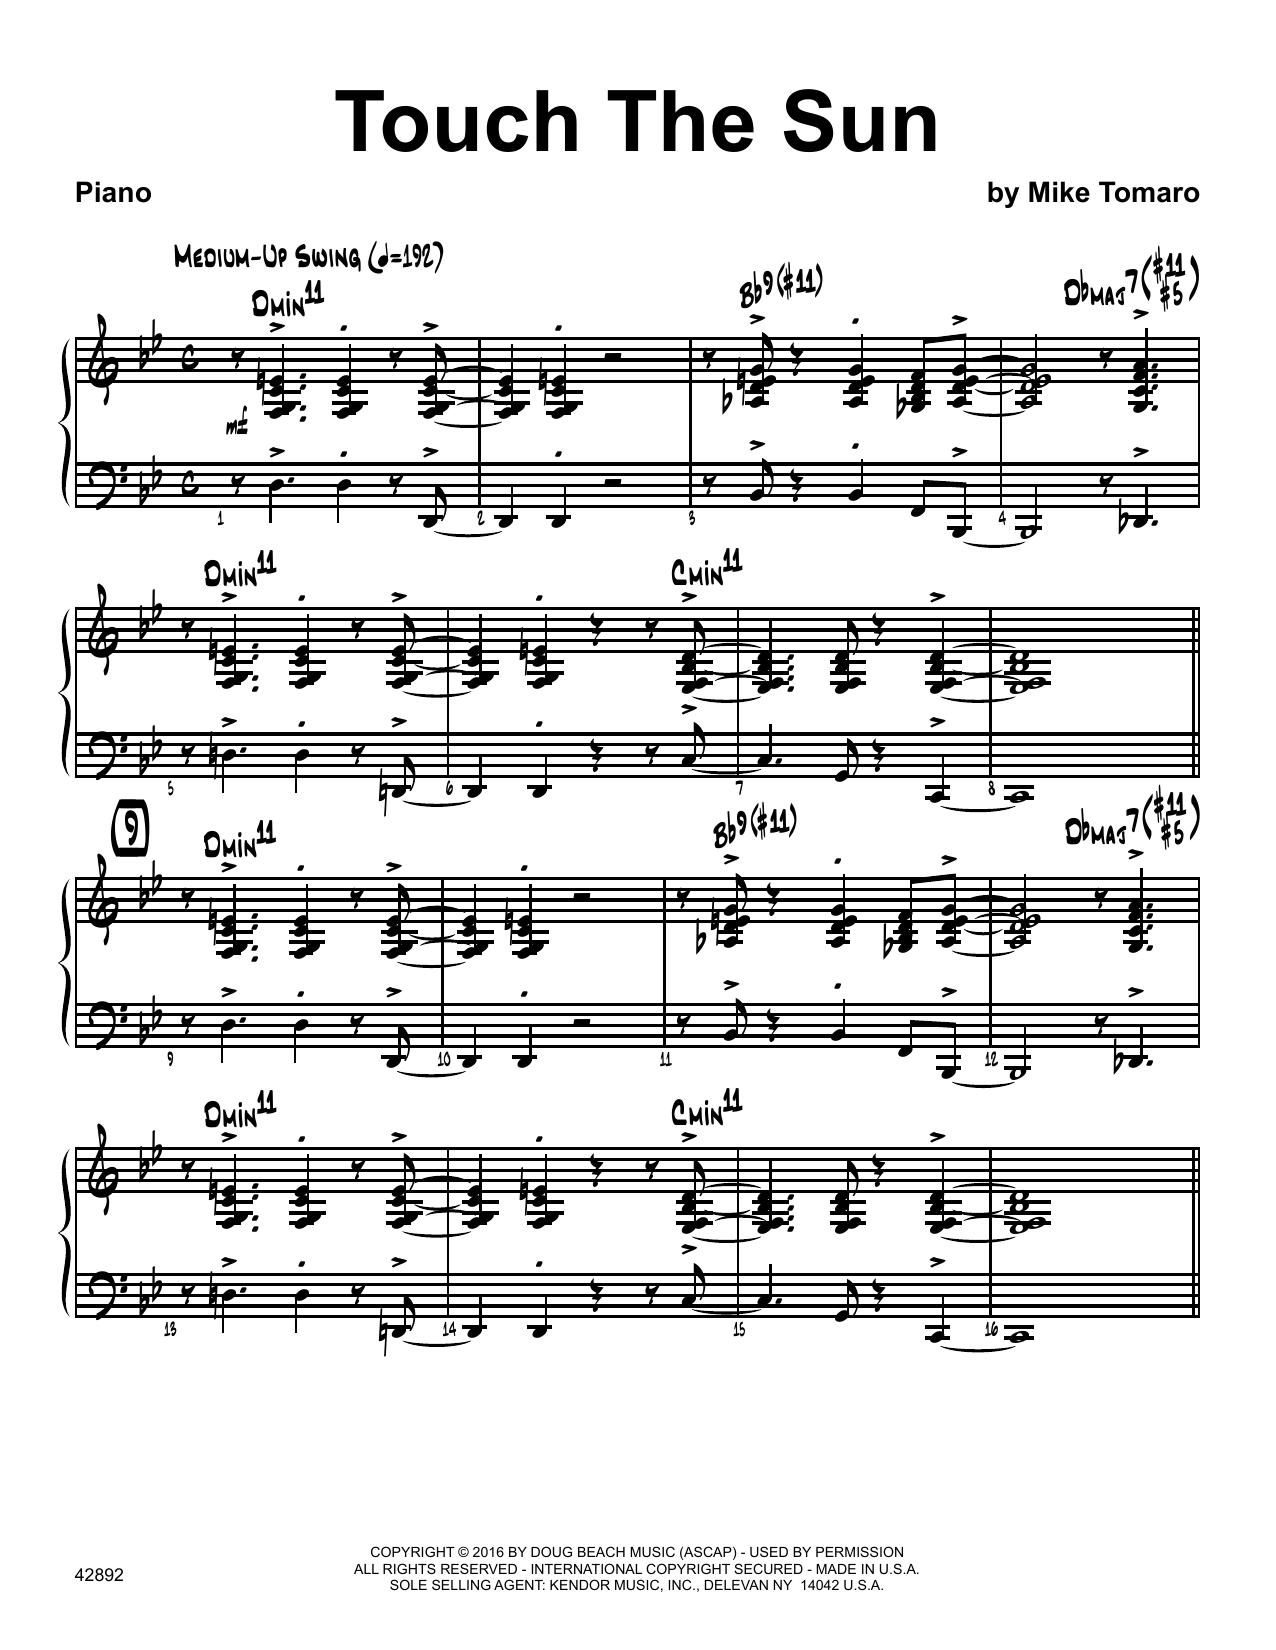 Touch The Sun - Piano Sheet Music